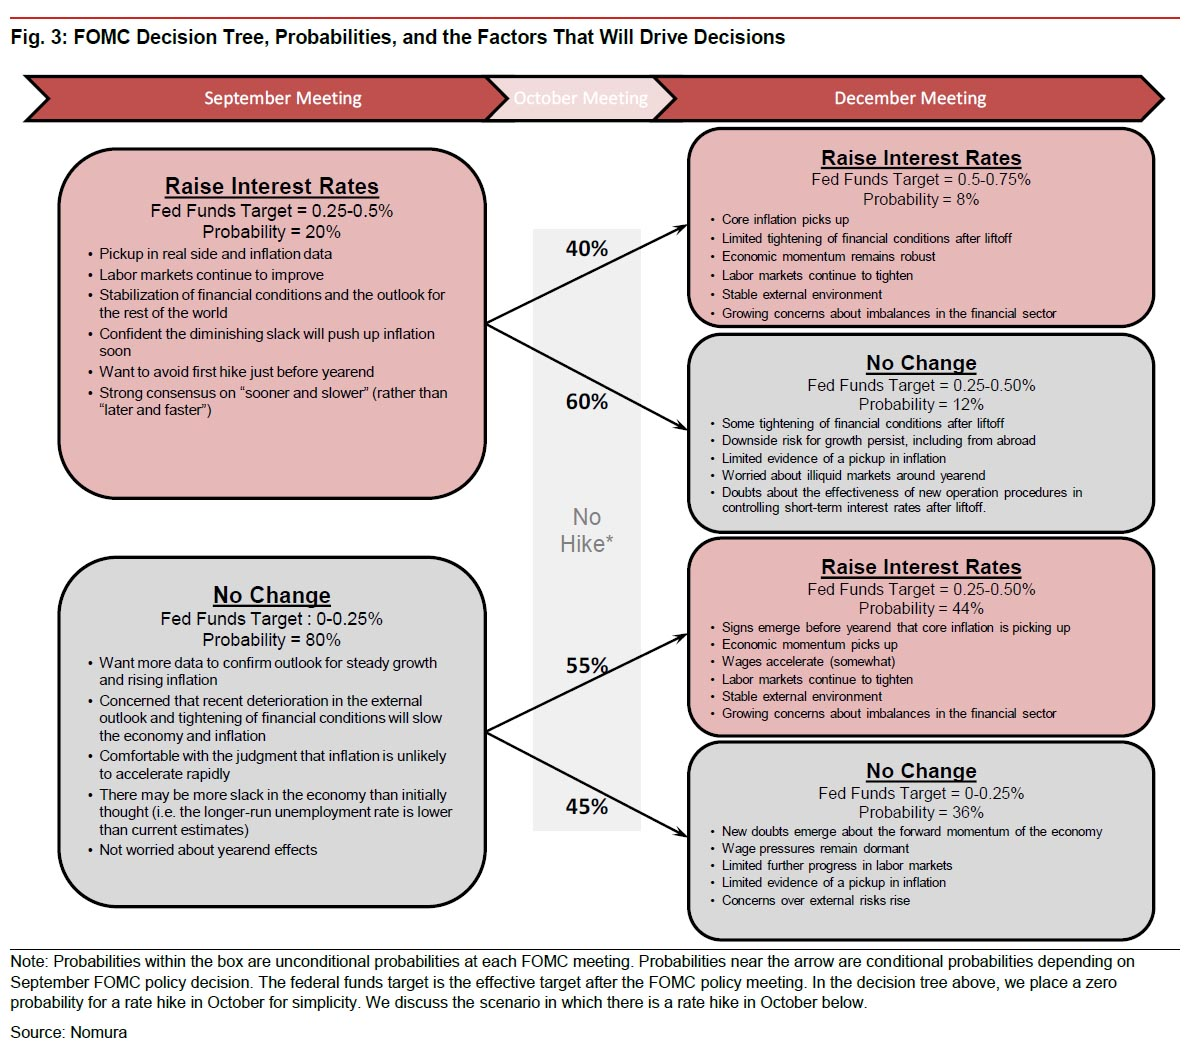 FOMC decision tree